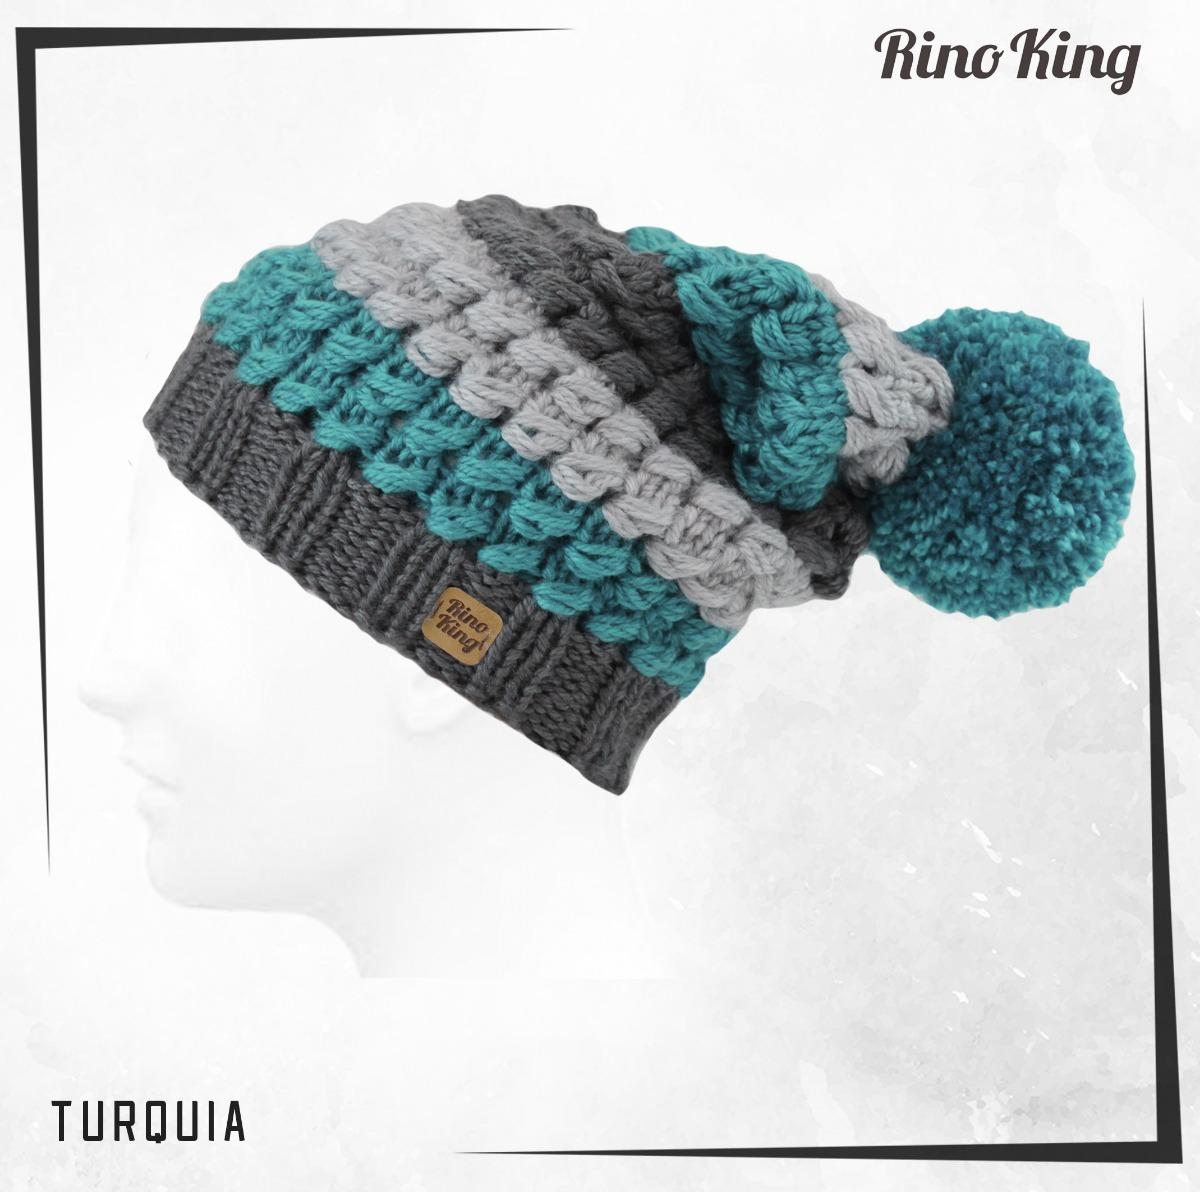 Gorro Hombre Mujer Rino King Modelo Turquía Calidad Premium - $ 377 ...